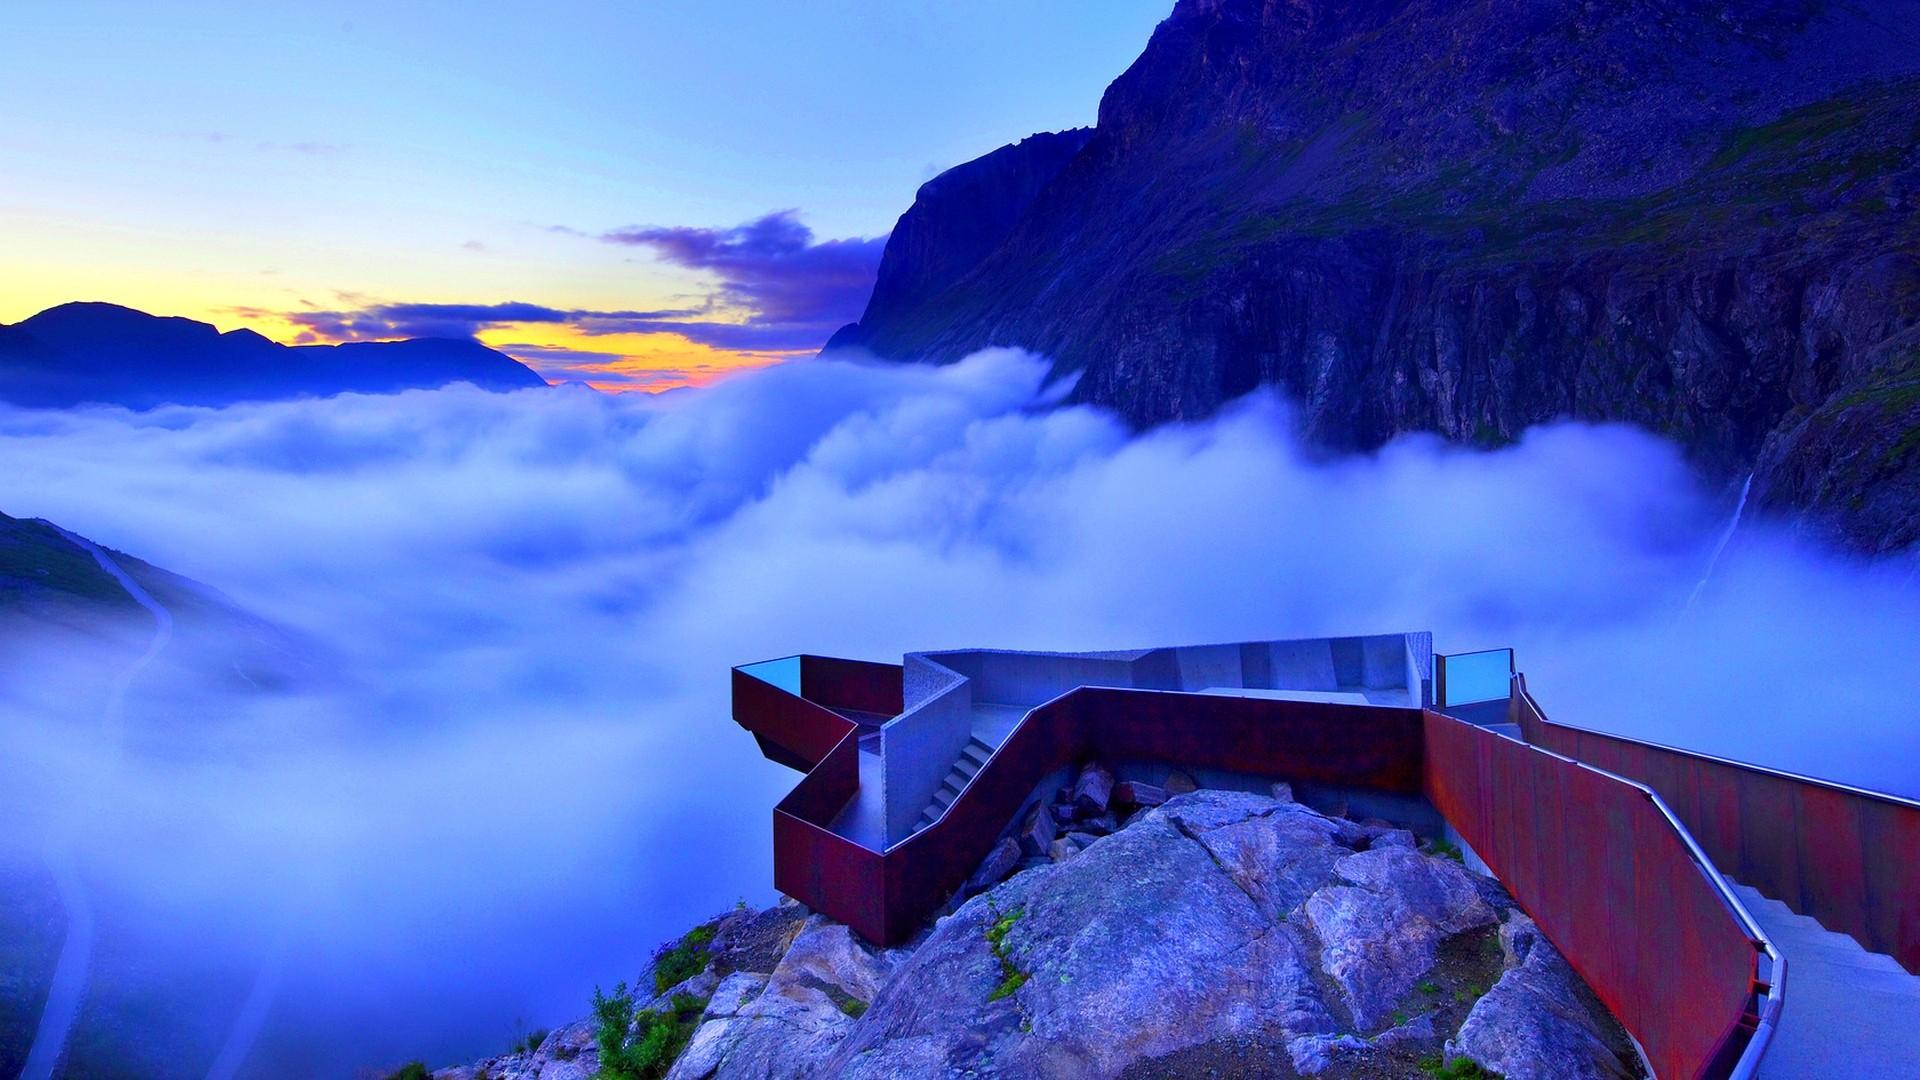 scenic views wallpaper hd - photo #22